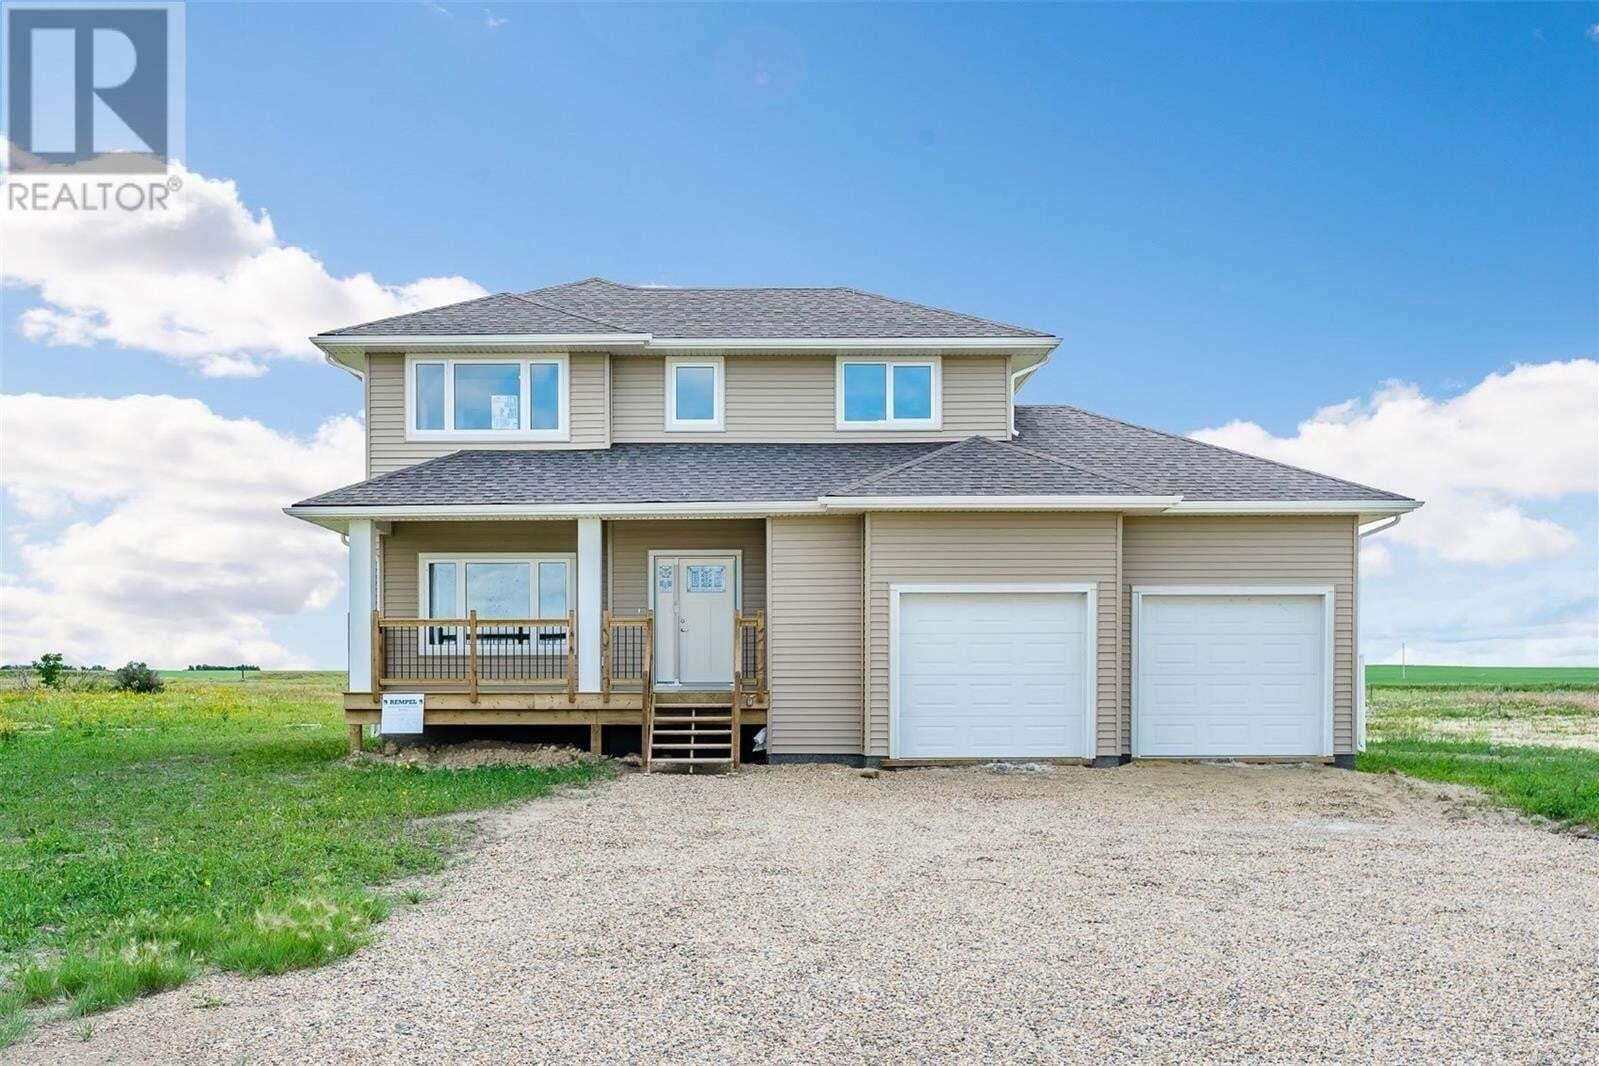 House for sale at 64 Meadowlark Cres Blucher Rm No. 343 Saskatchewan - MLS: SK813894